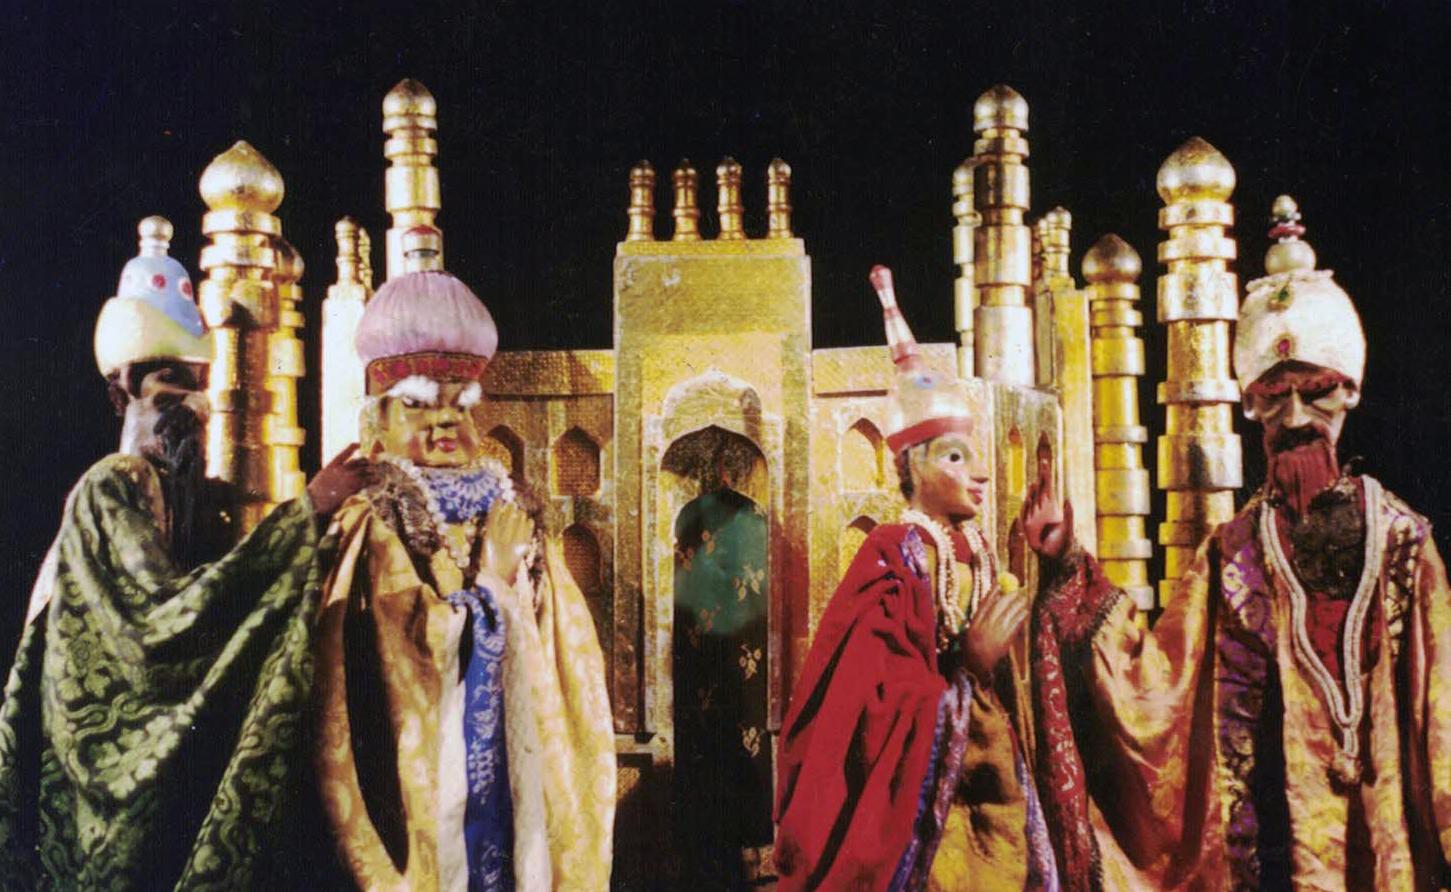 Aladin par Sudip Ghosh (Bengale occidental, Inde). Marionnettes à tiges